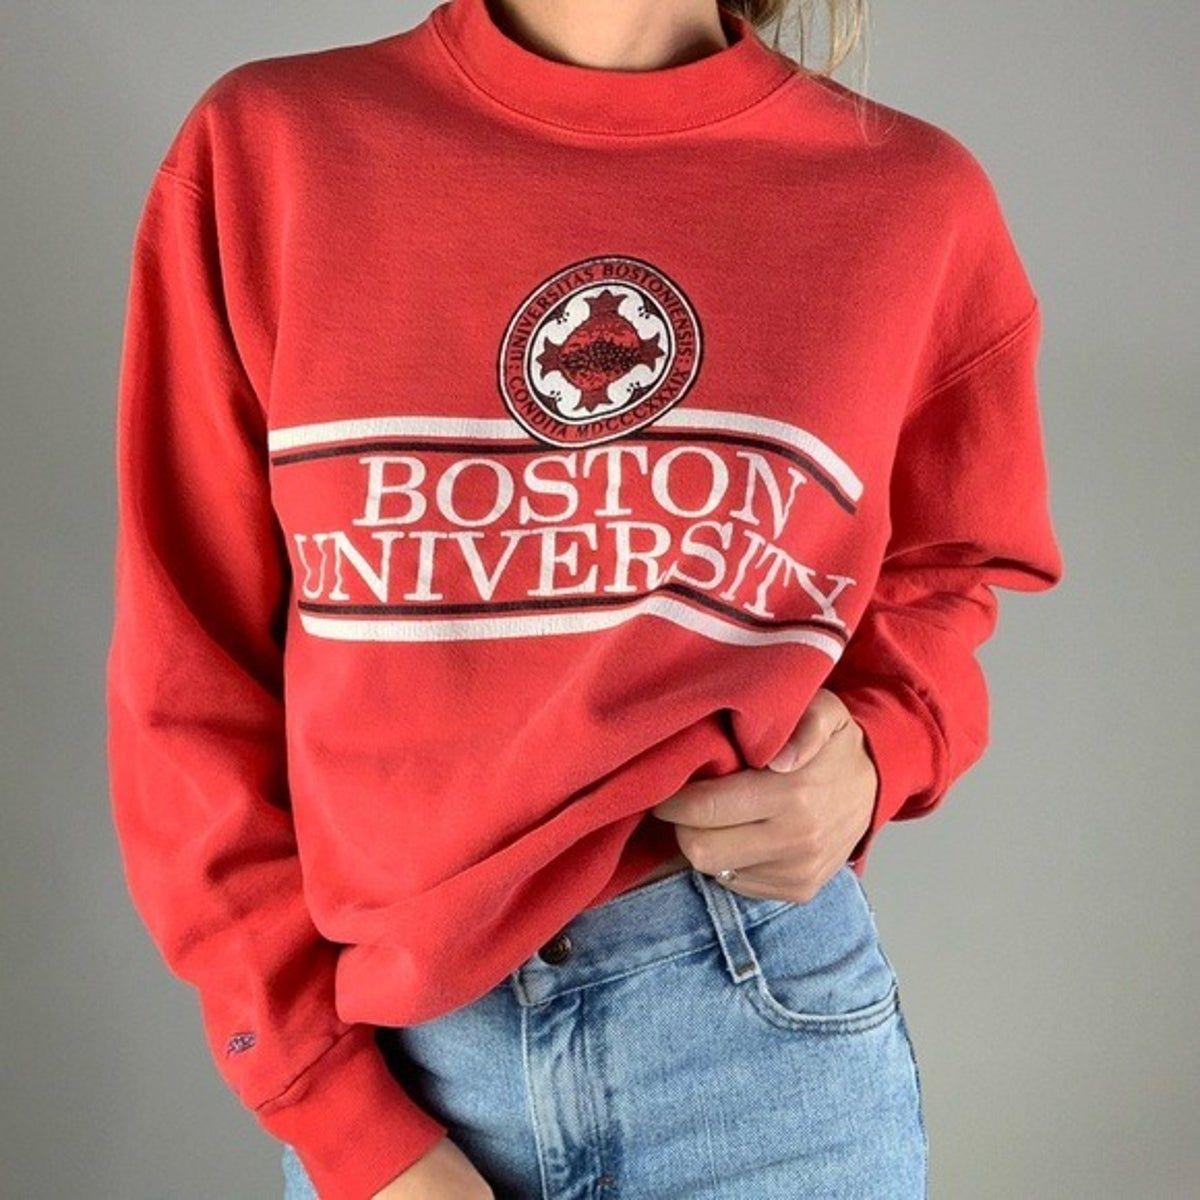 Vintage Boston University Red Crewneck S University Outfit Red Crewneck Boston University [ 1200 x 1200 Pixel ]